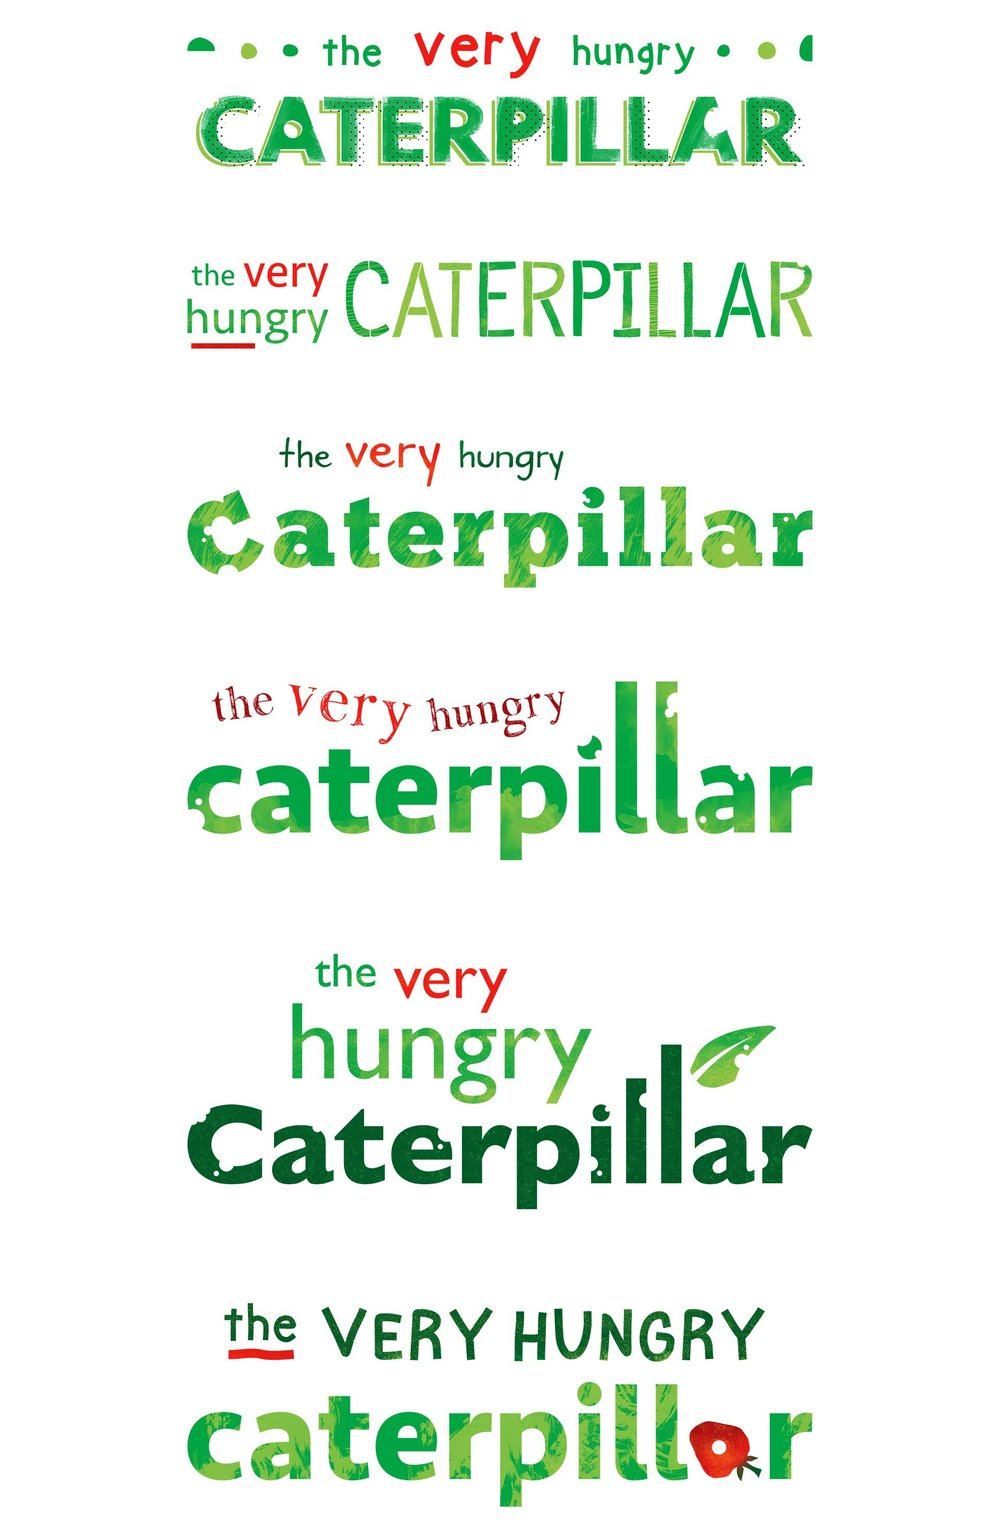 HungryCaterpillar_08.jpg